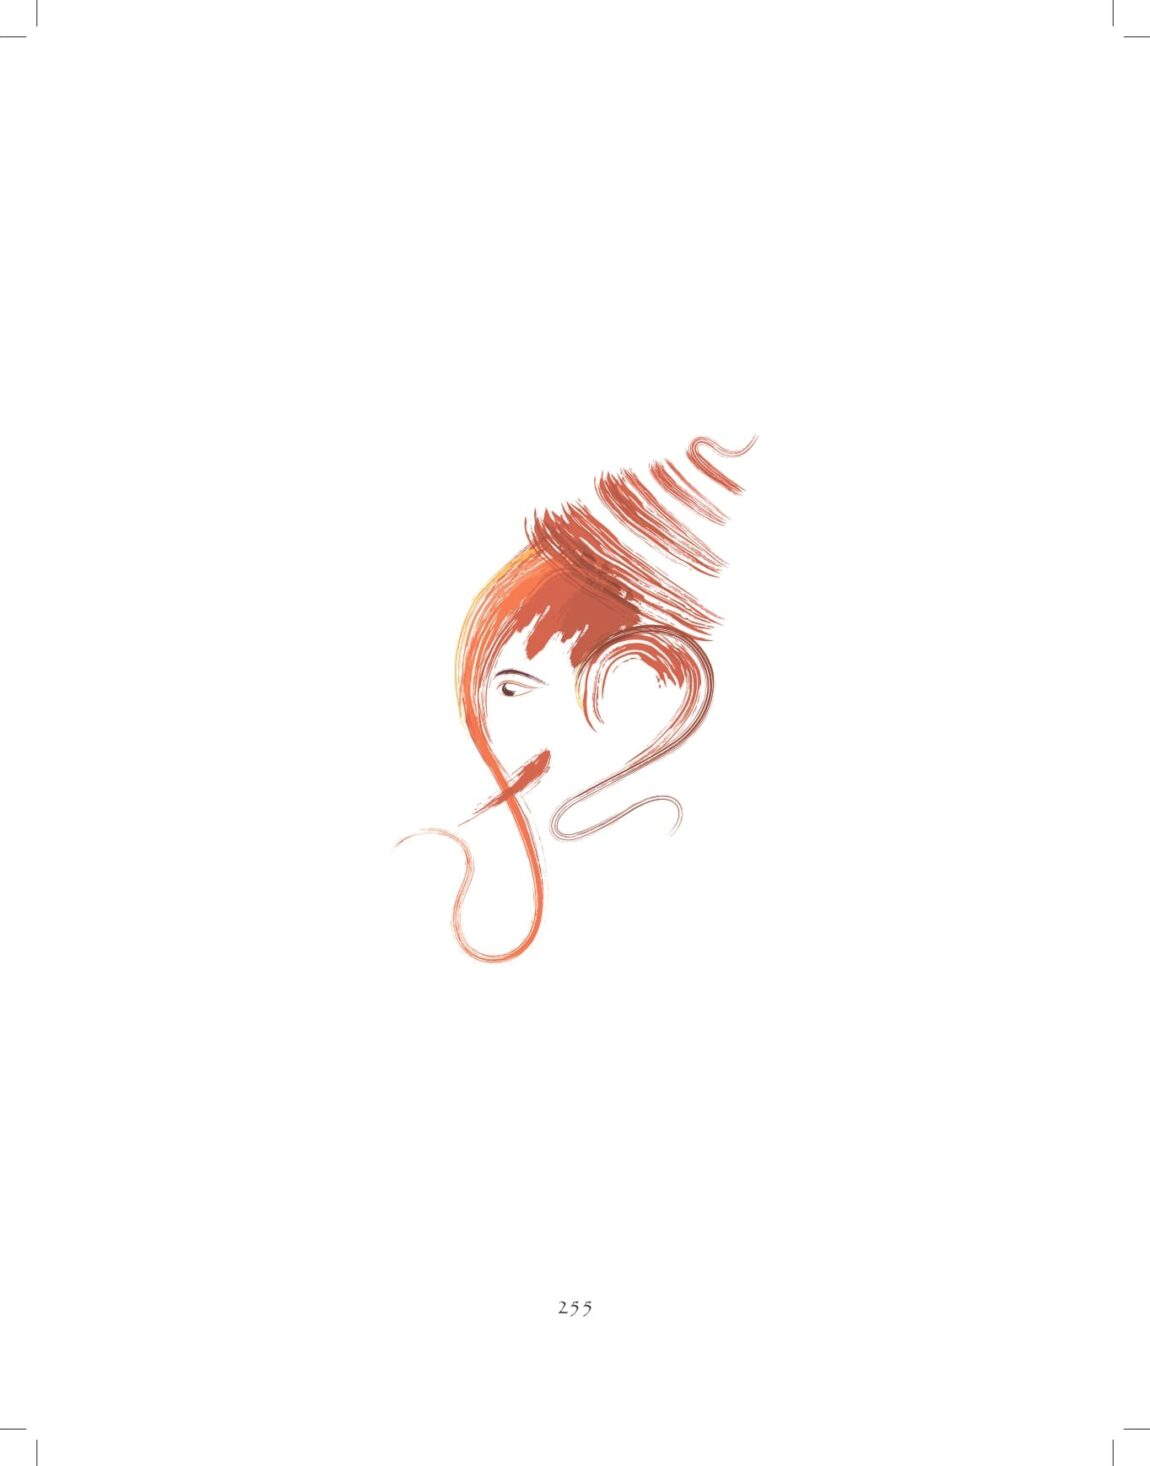 Ganesh-print_pages-to-jpg-0255.jpg